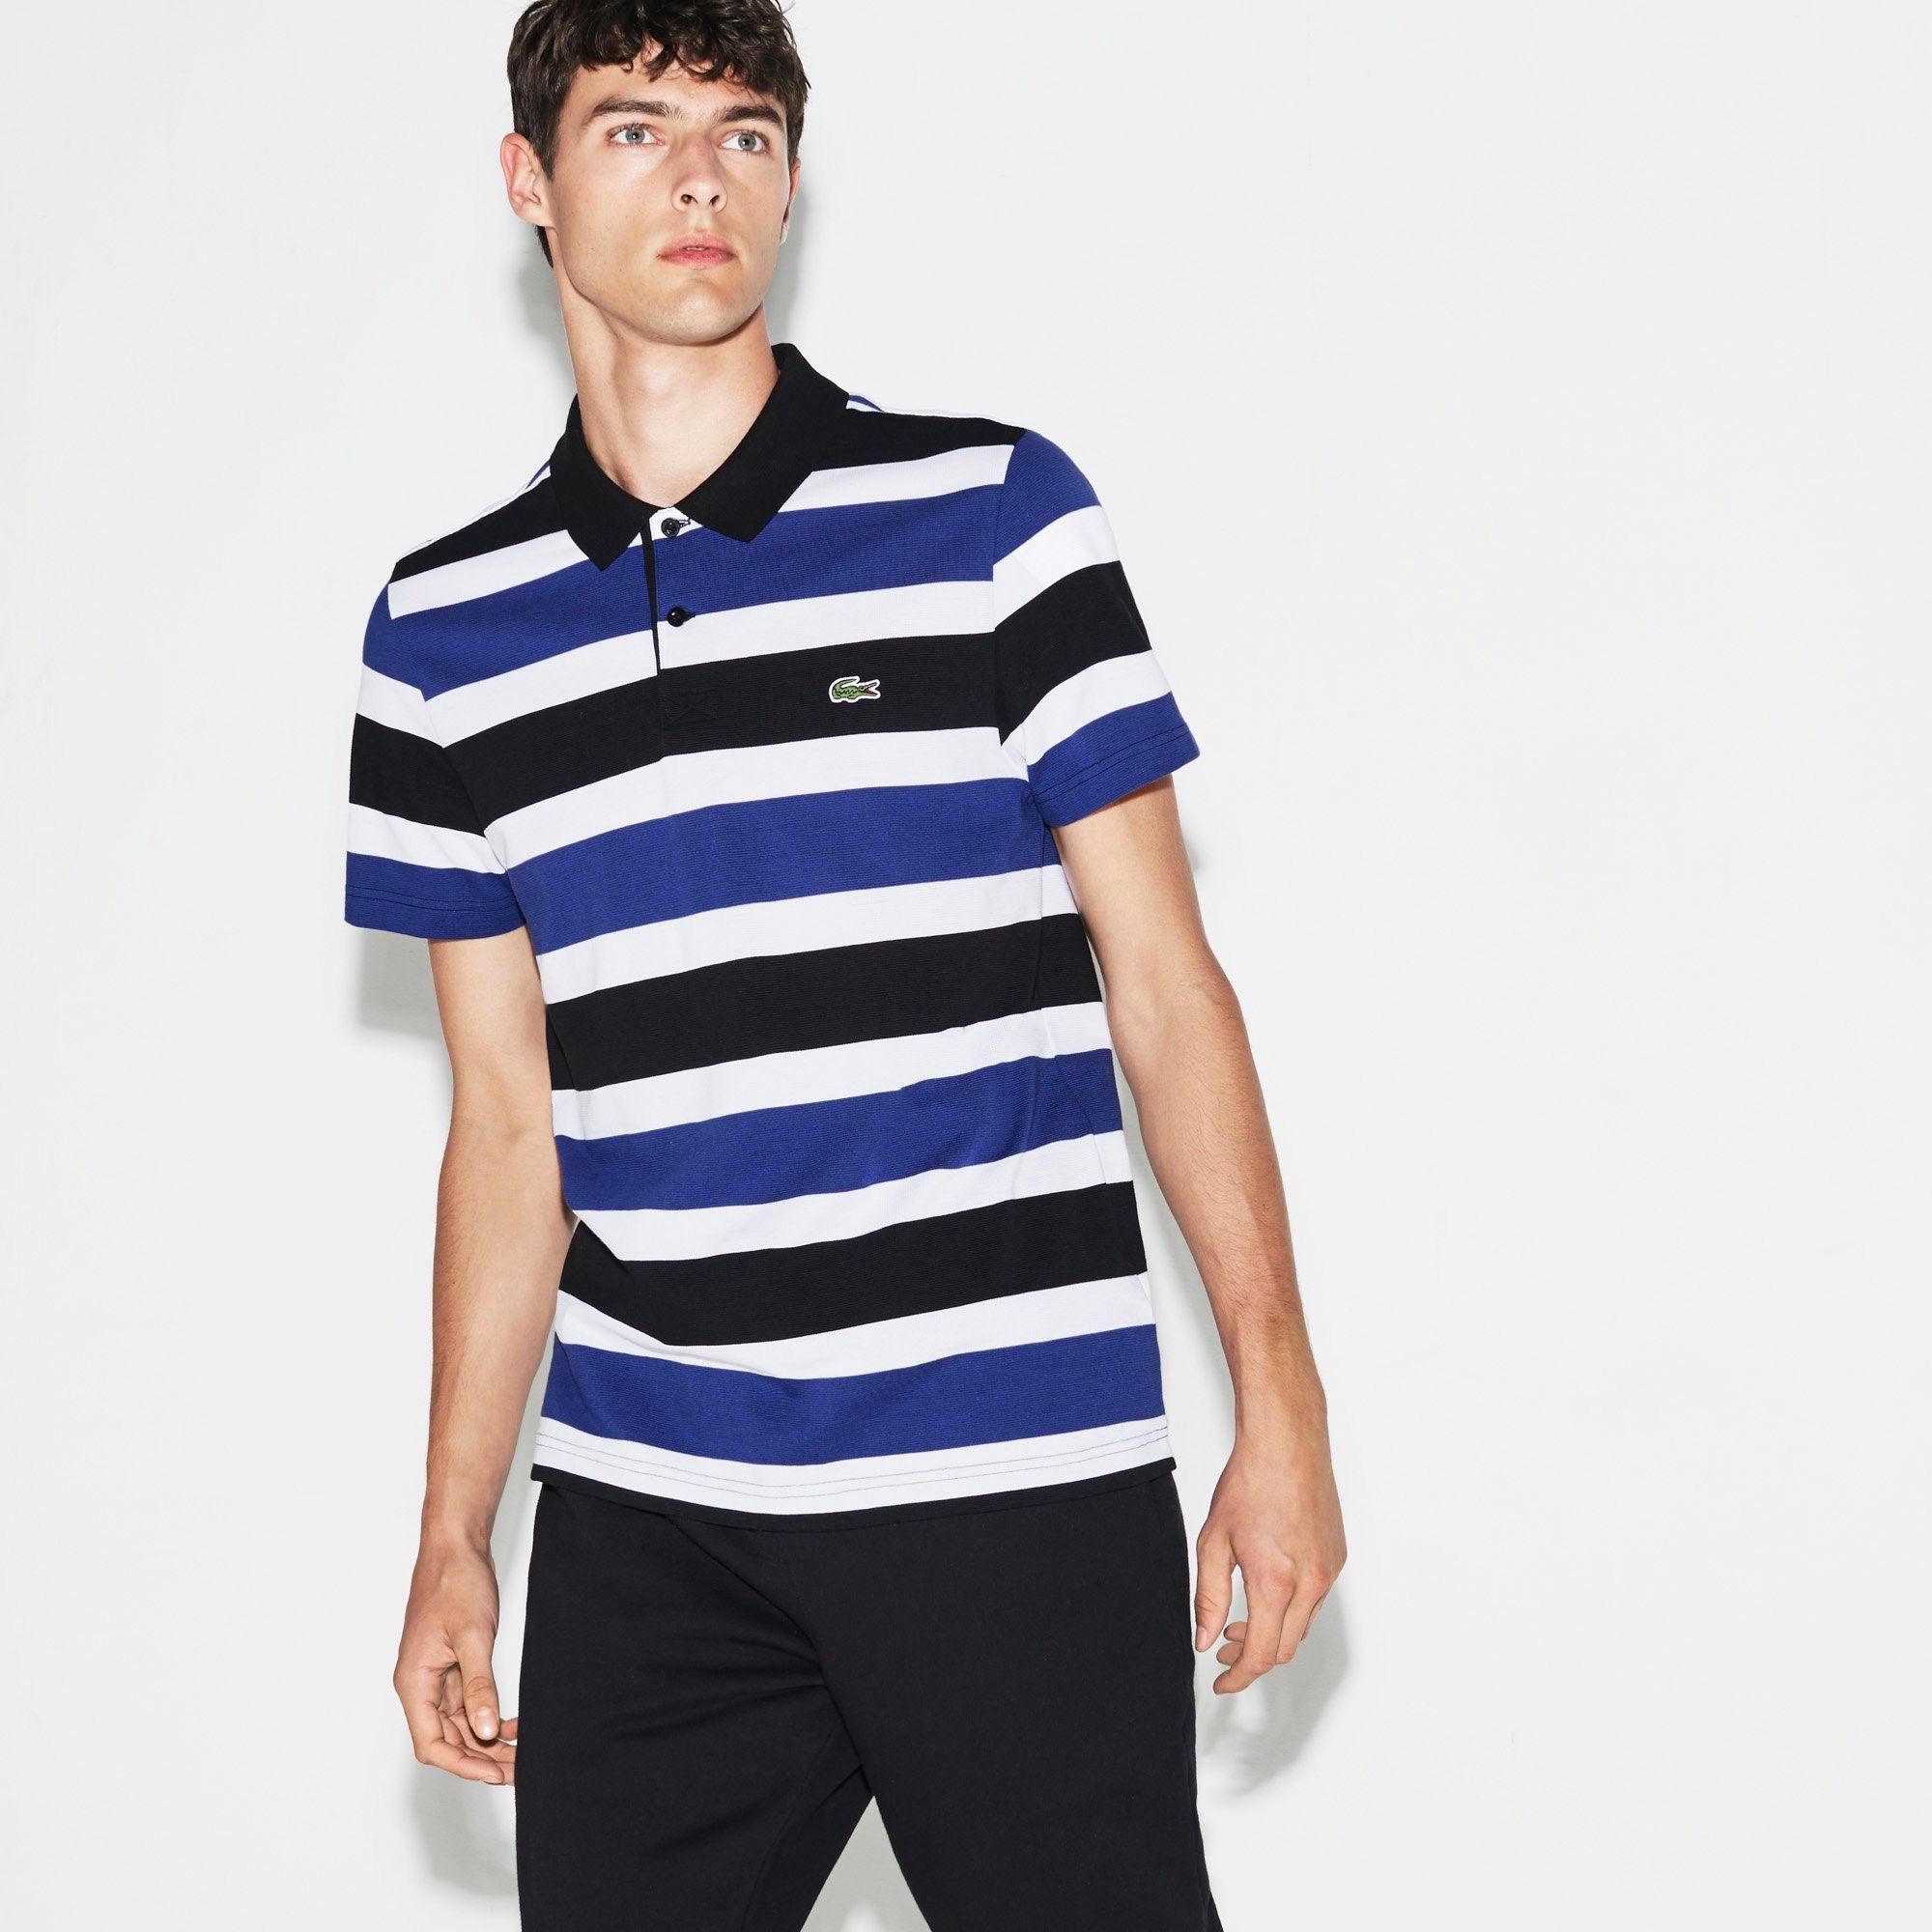 70e74dfb06 LACOSTE Men's SPORT Tennis Ultra-Light Striped Knit Polo - black ...